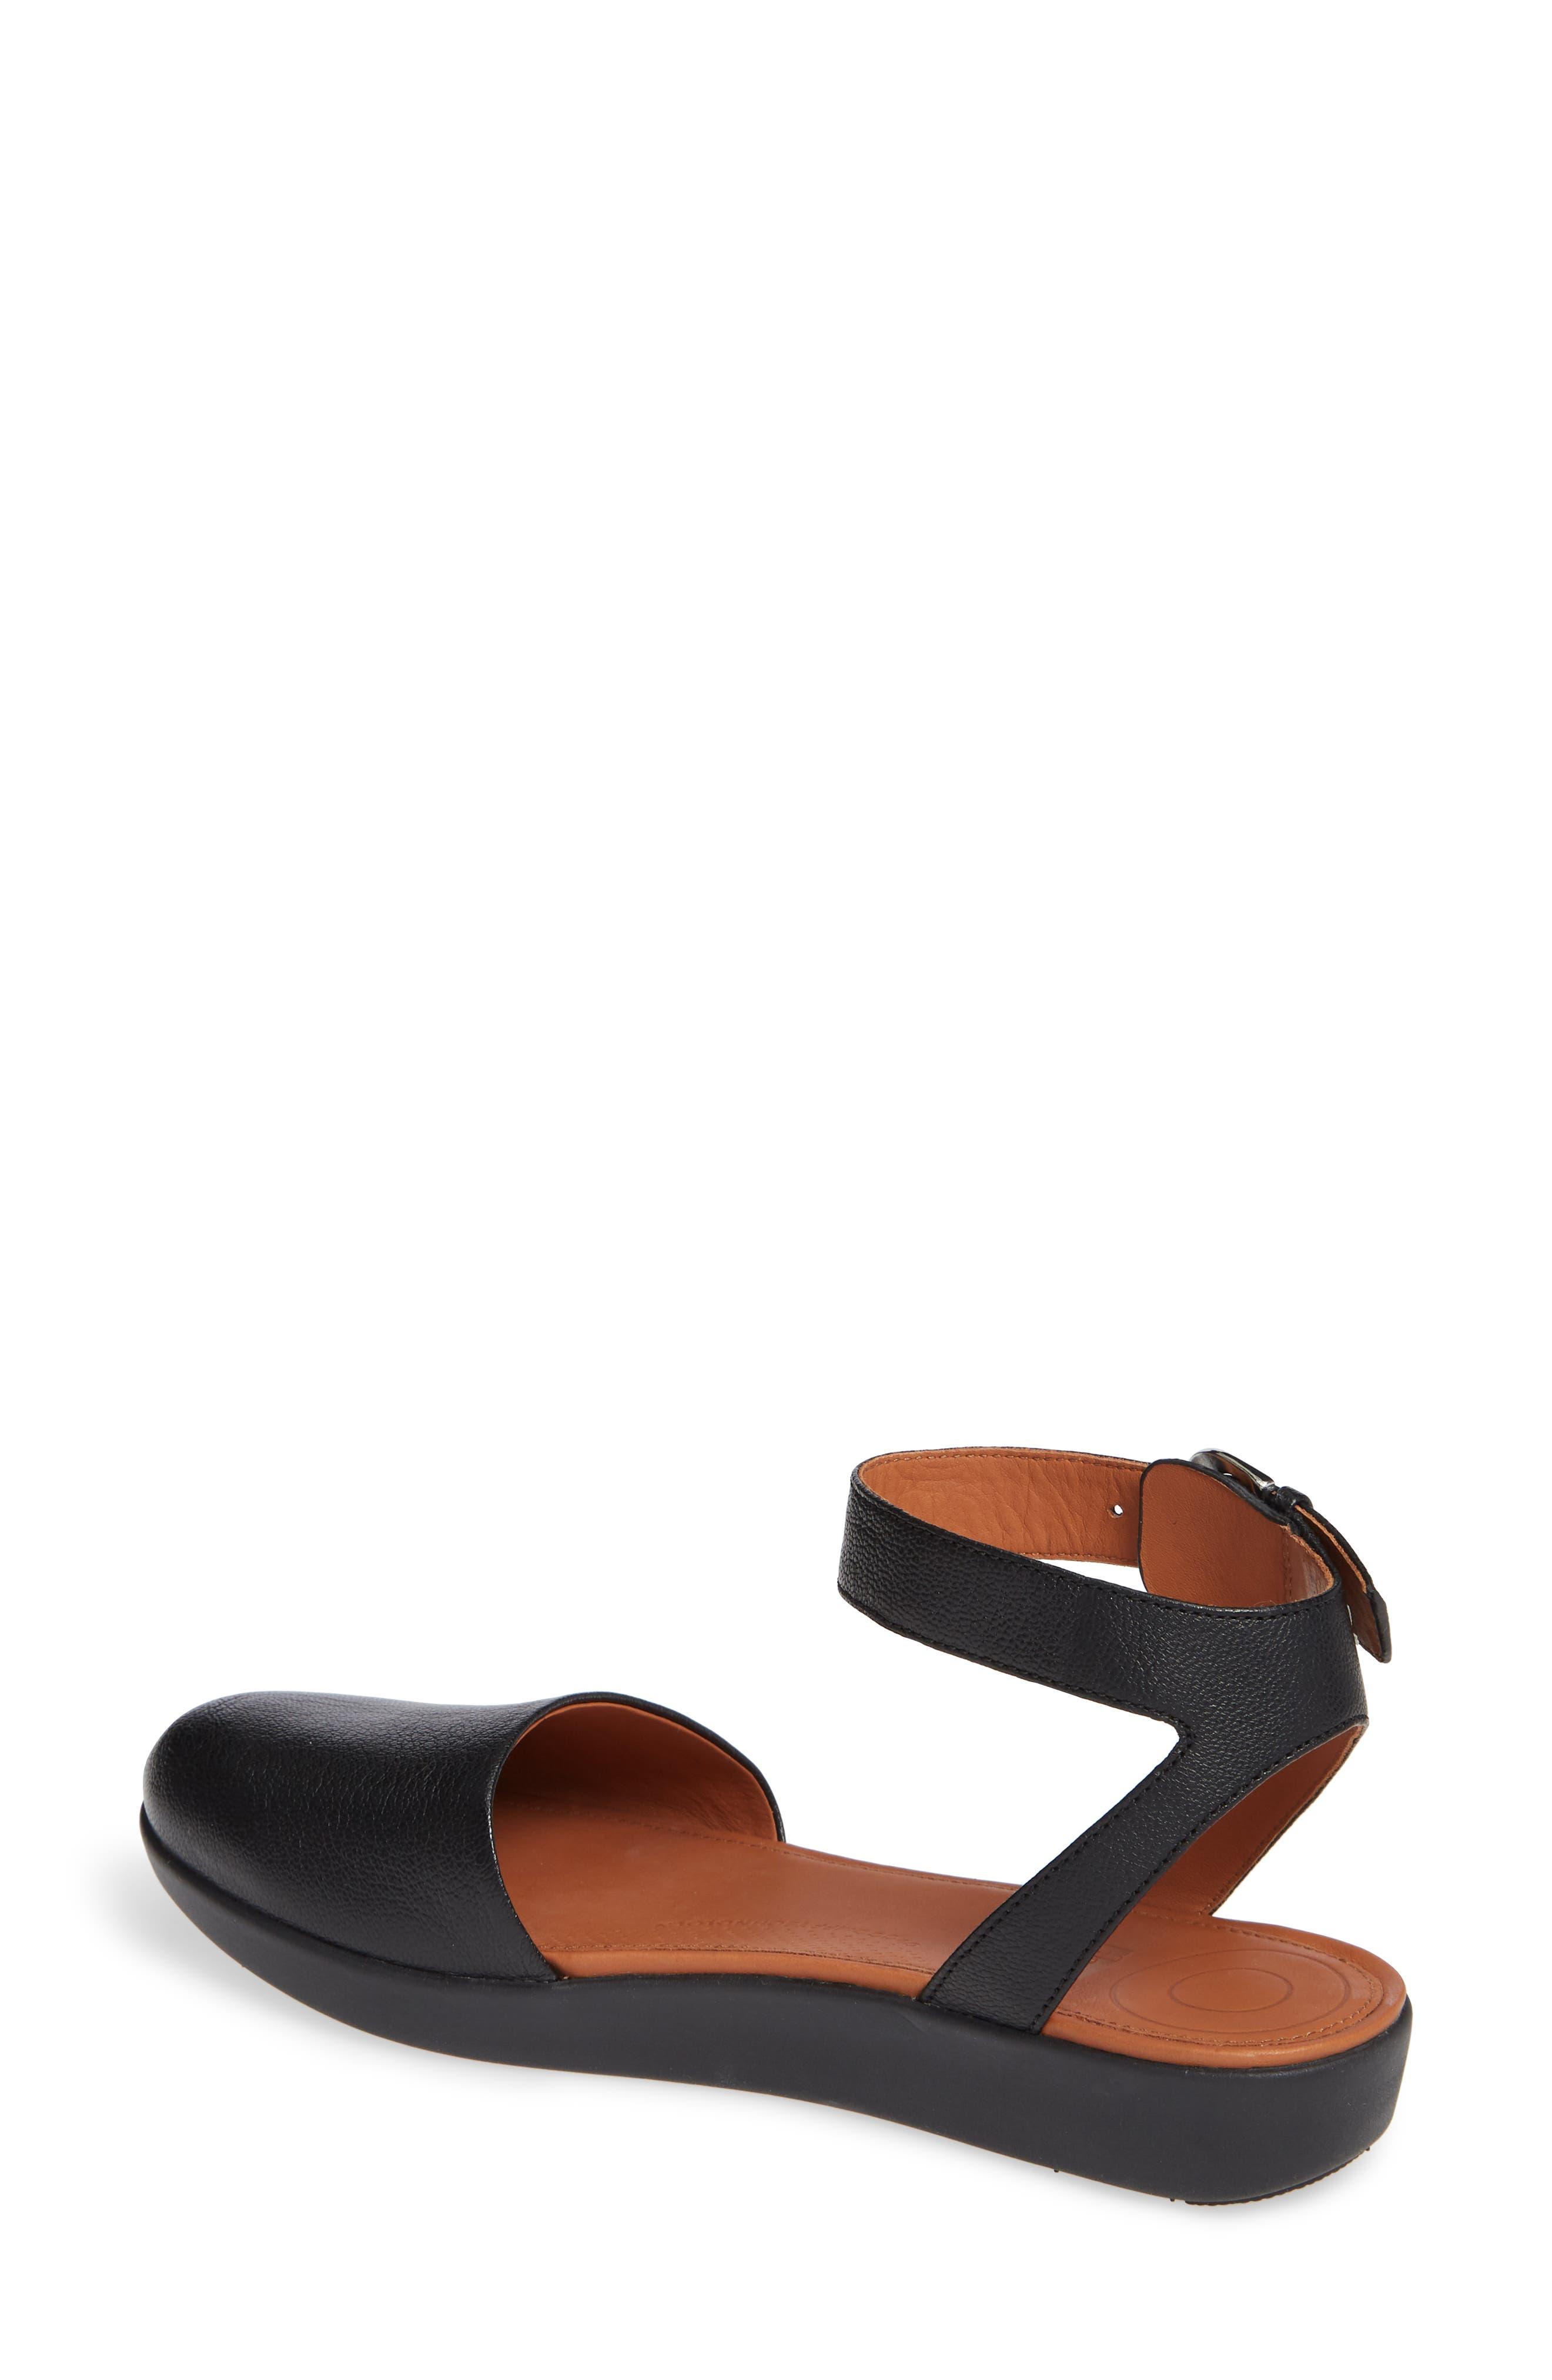 Cova Ankle Strap Sandal,                             Alternate thumbnail 2, color,                             BLACK LEATHER